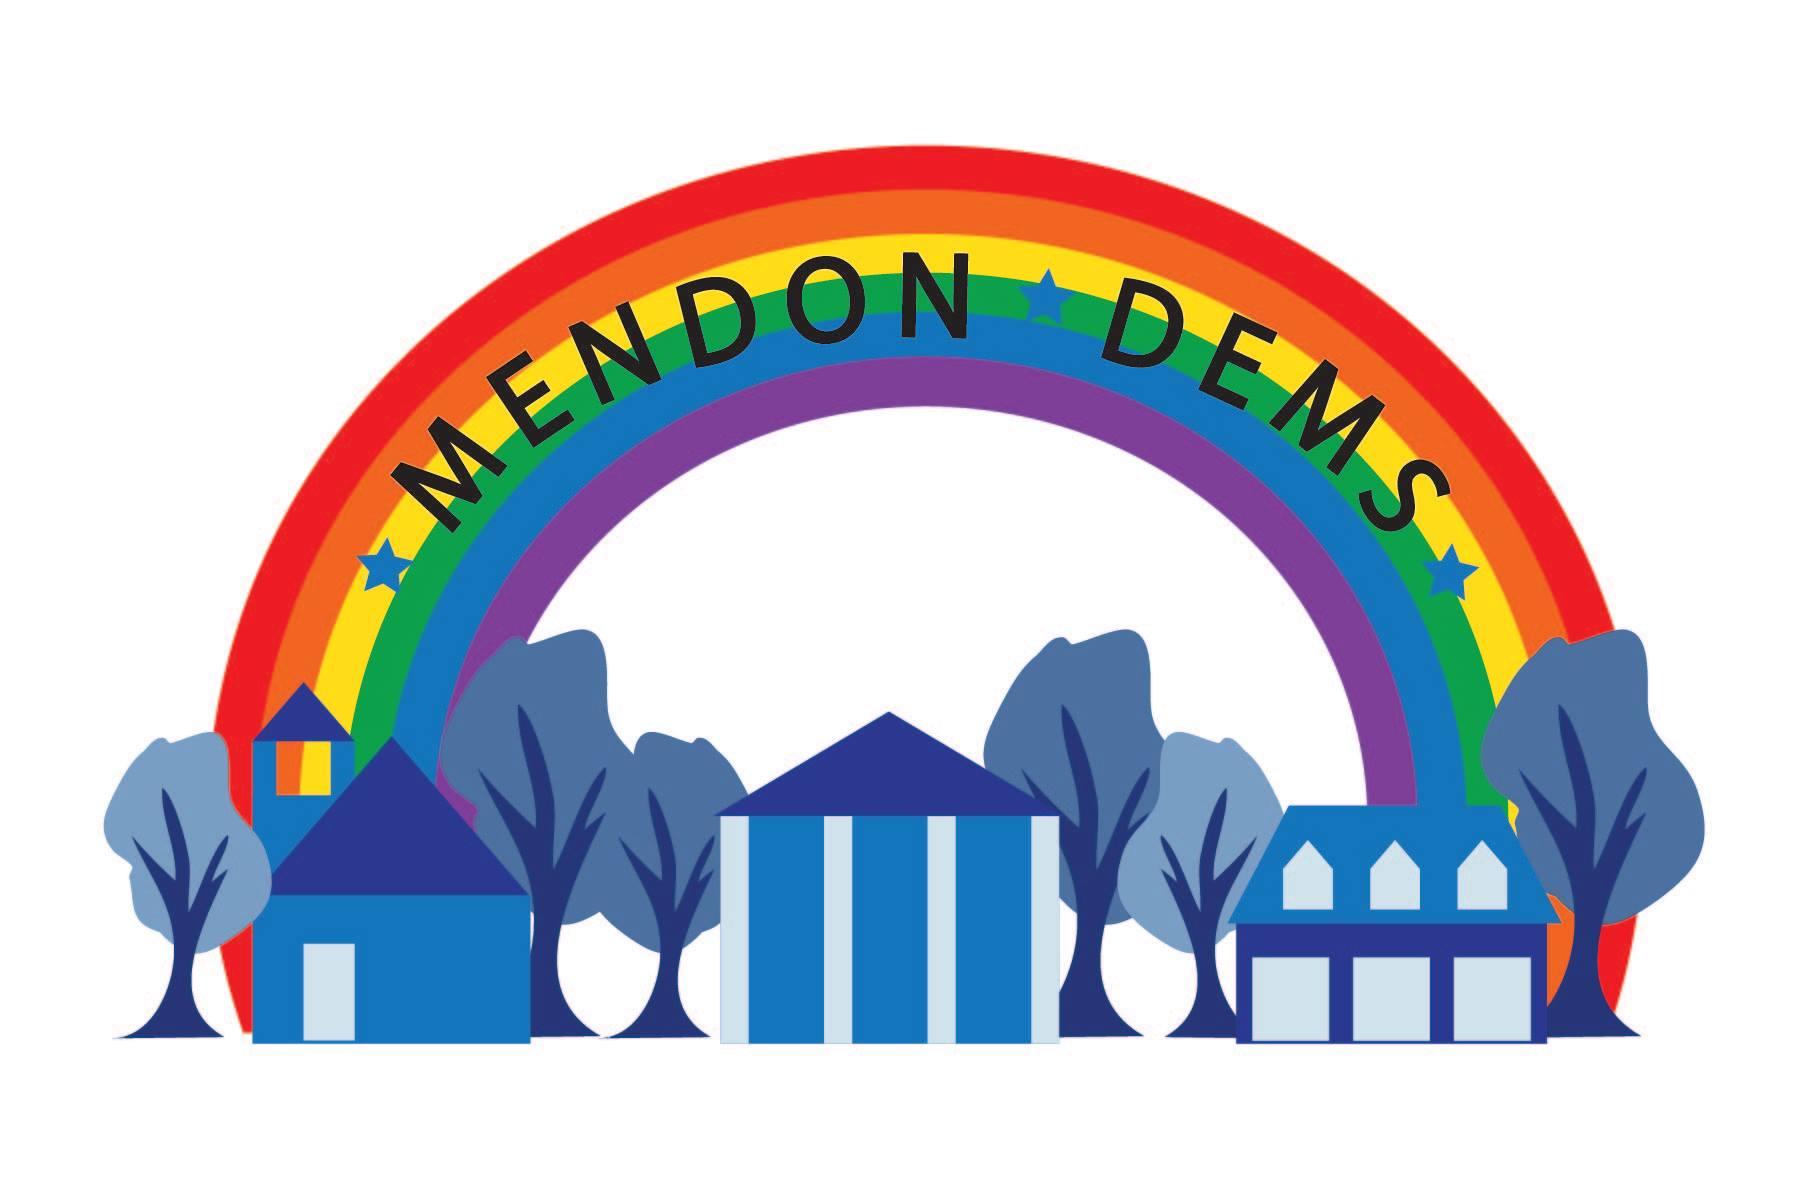 Mendon DTC